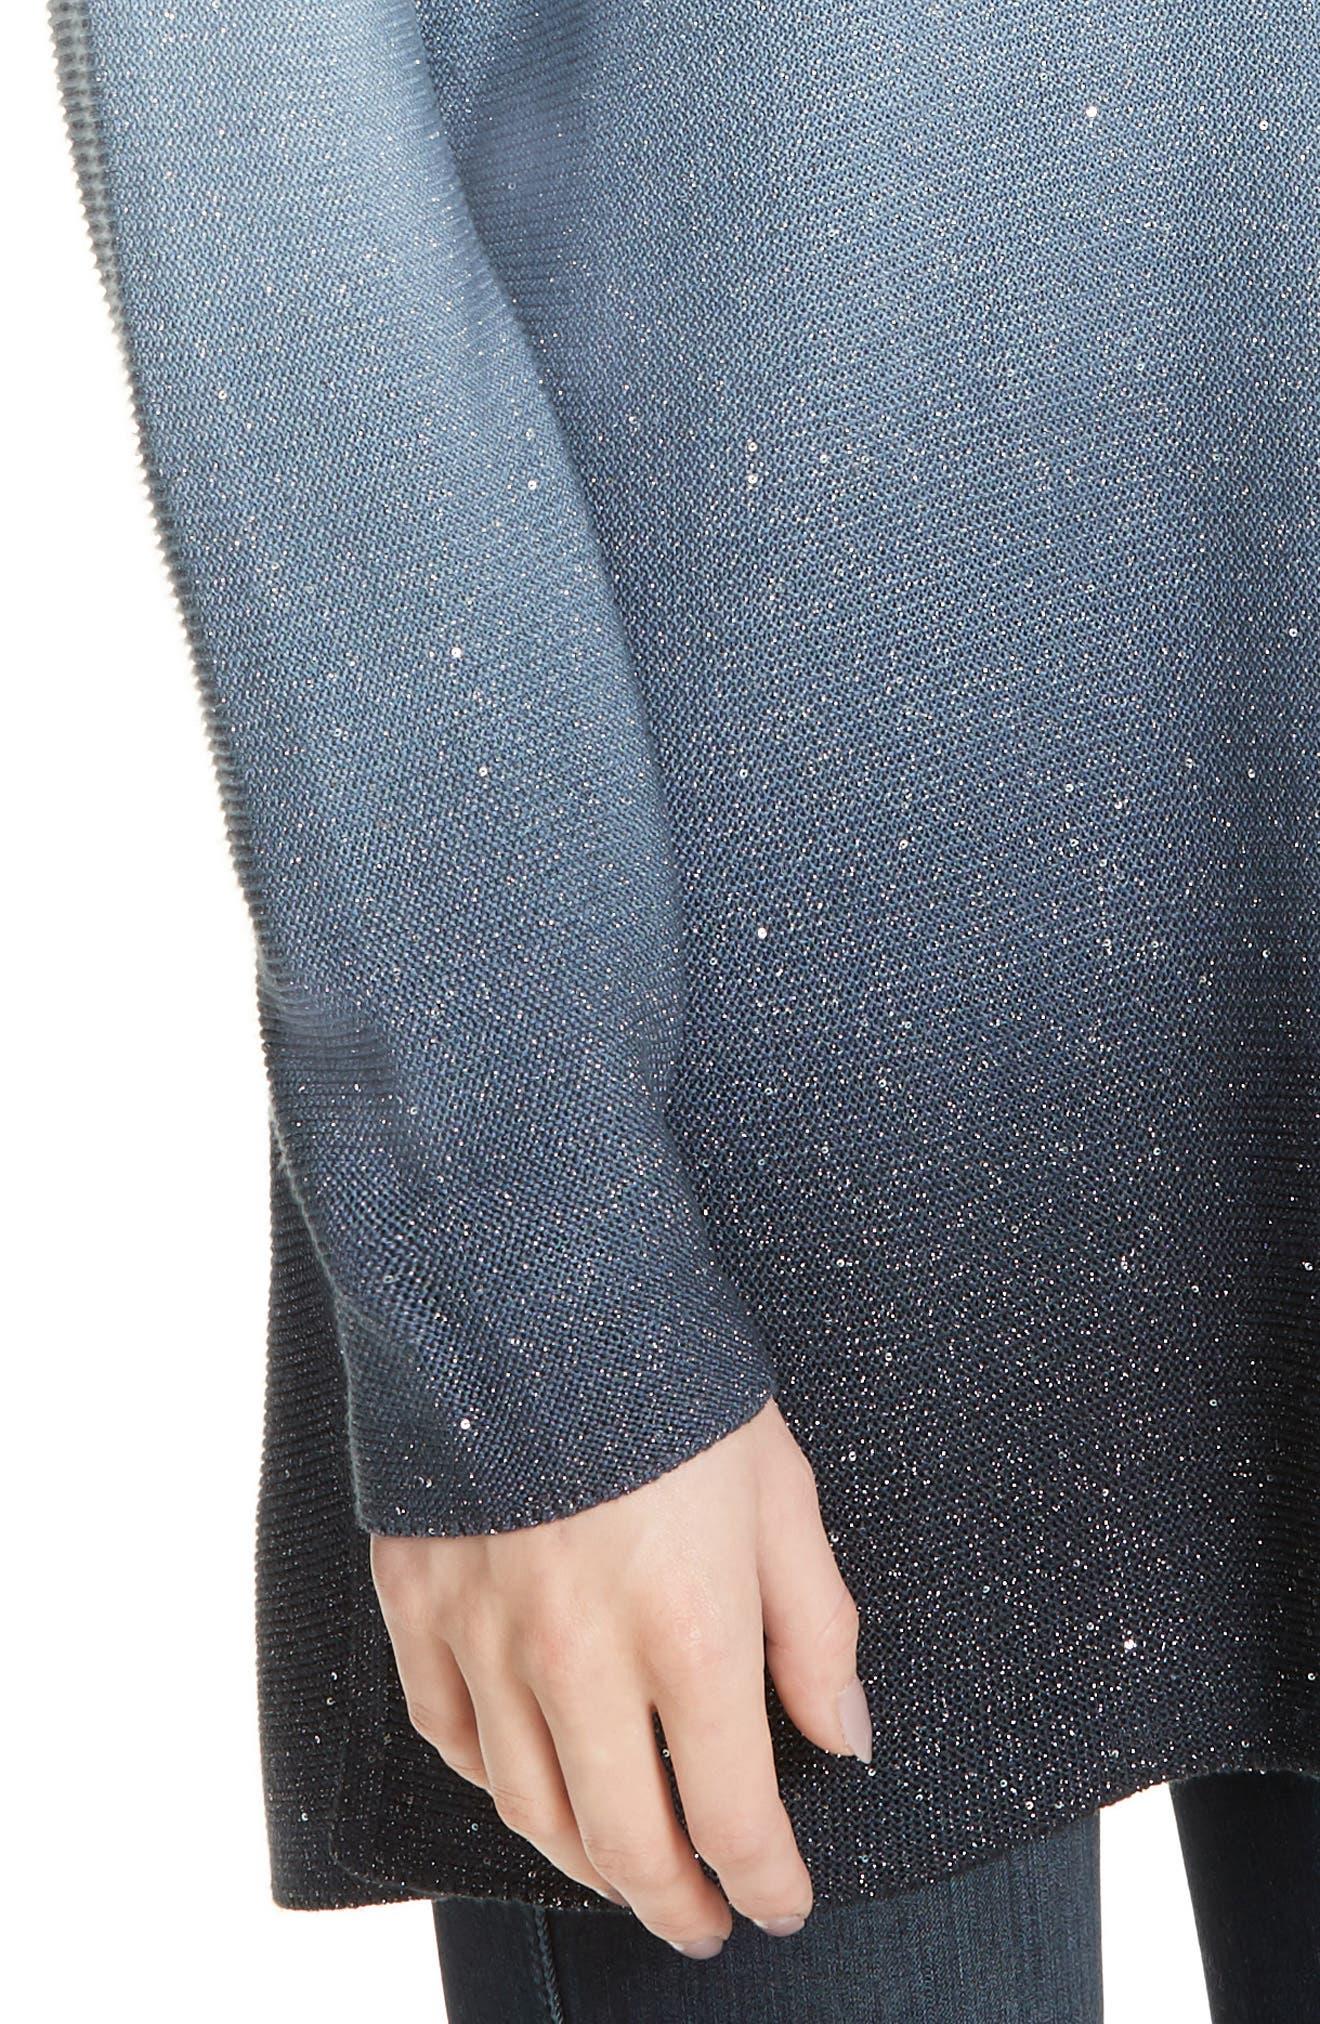 LAFAYETTE 148 NEW YORK, Sequin Ombré Silk Blend Tunic, Alternate thumbnail 4, color, SLATE BLUE MULTI